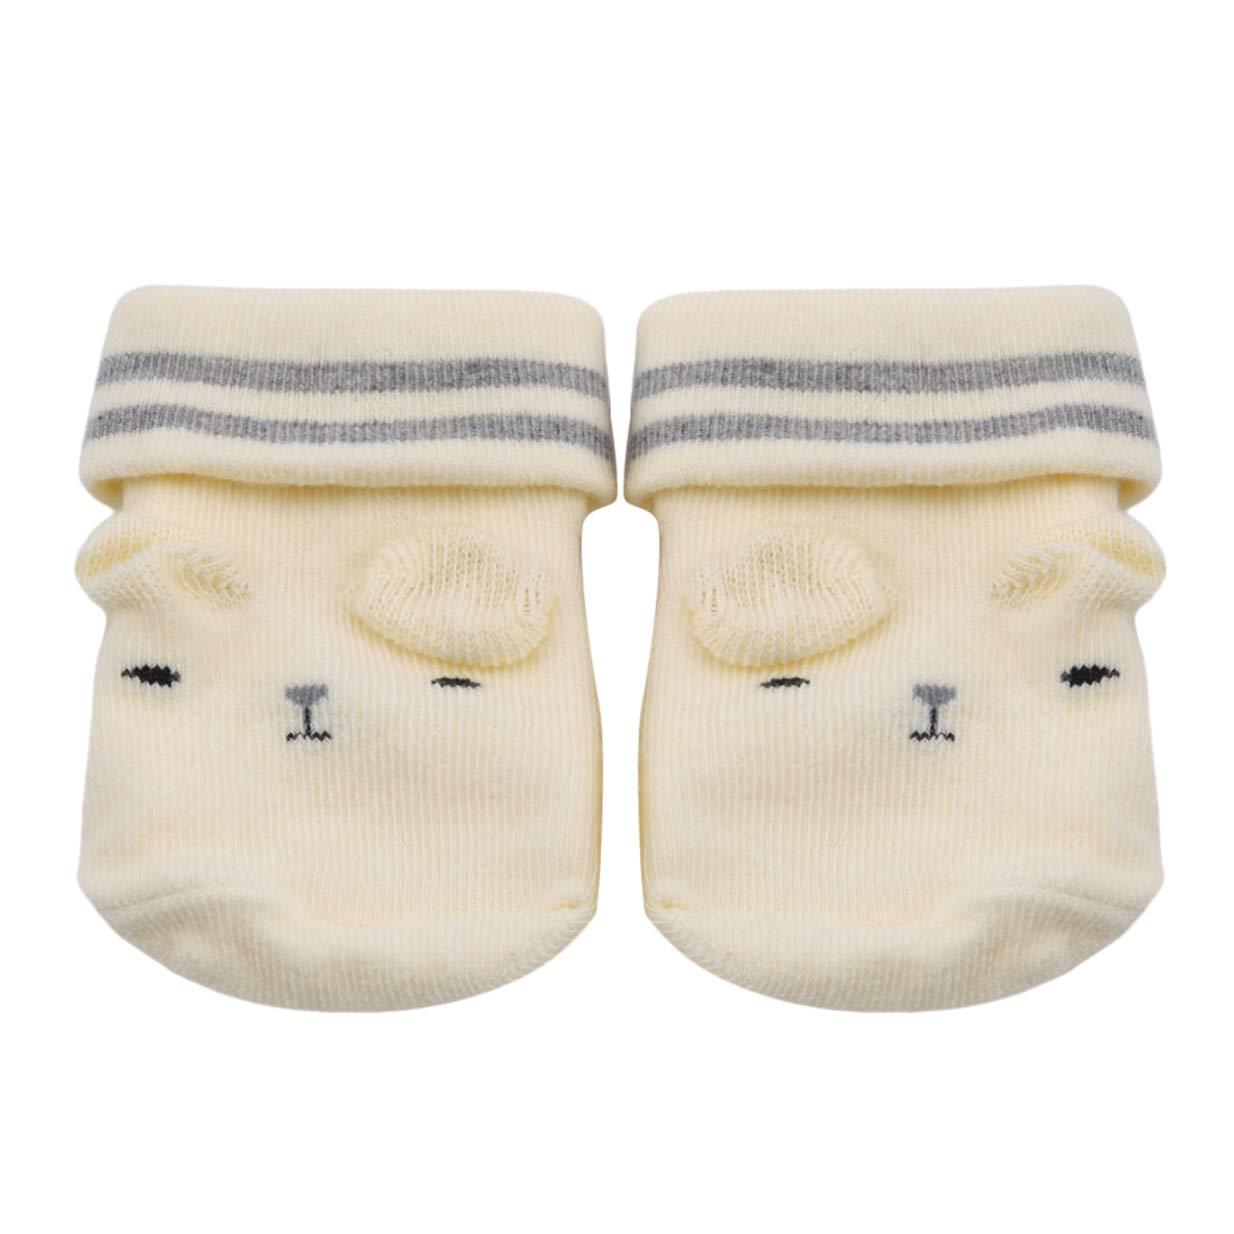 LALANG Cartoon Cute Baby Soft Three-dimensional Dispensing Anti-slip Socks Birthday Gifts